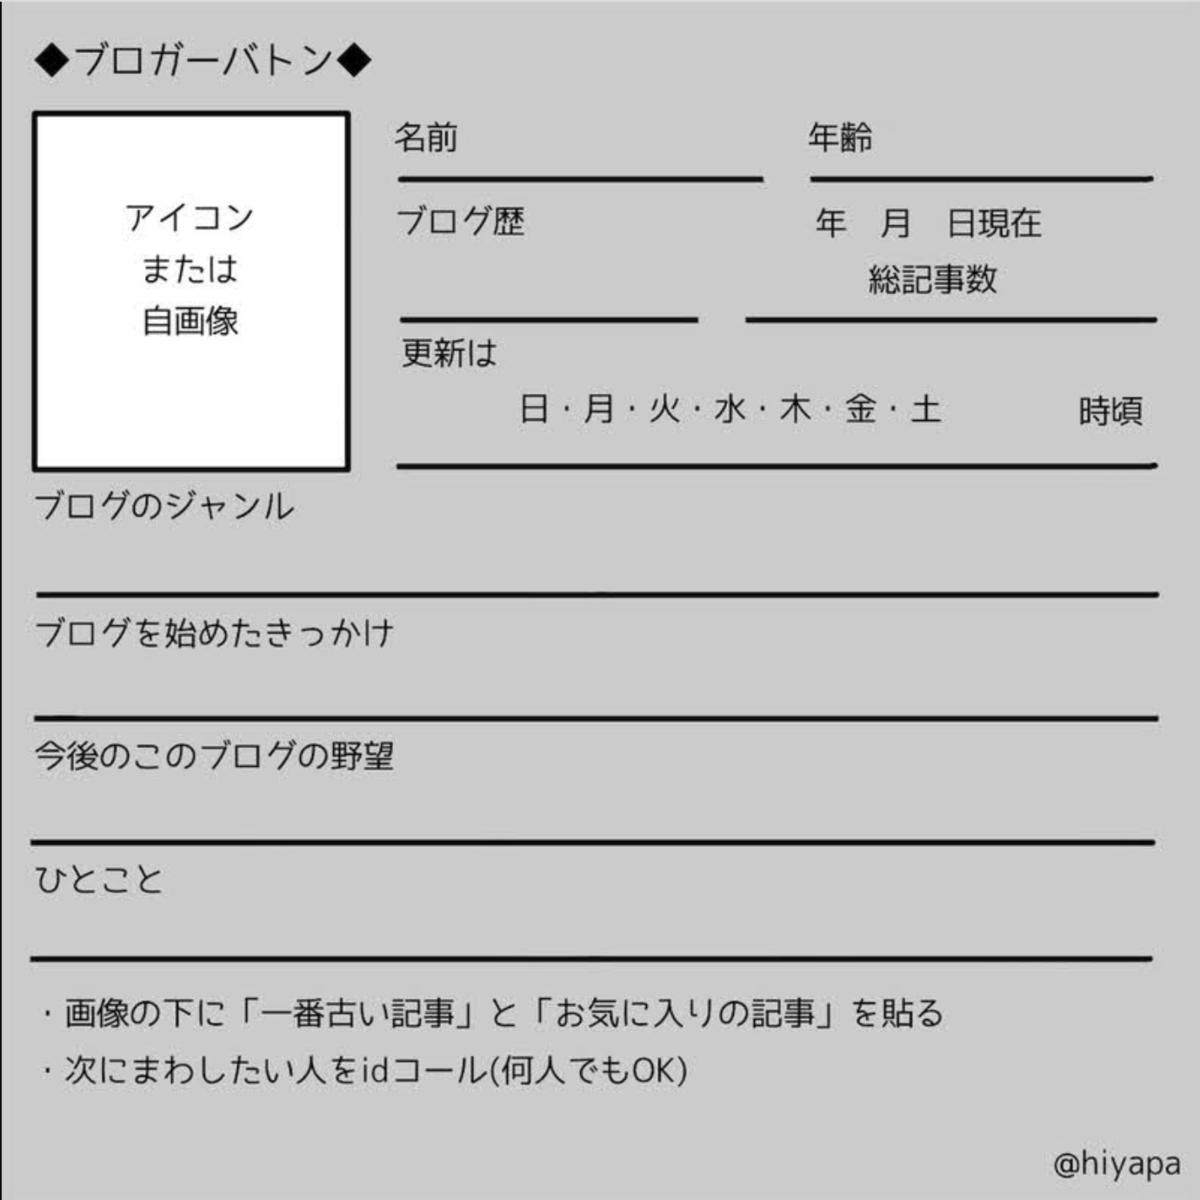 f:id:whitewitch:20200707214312p:plain